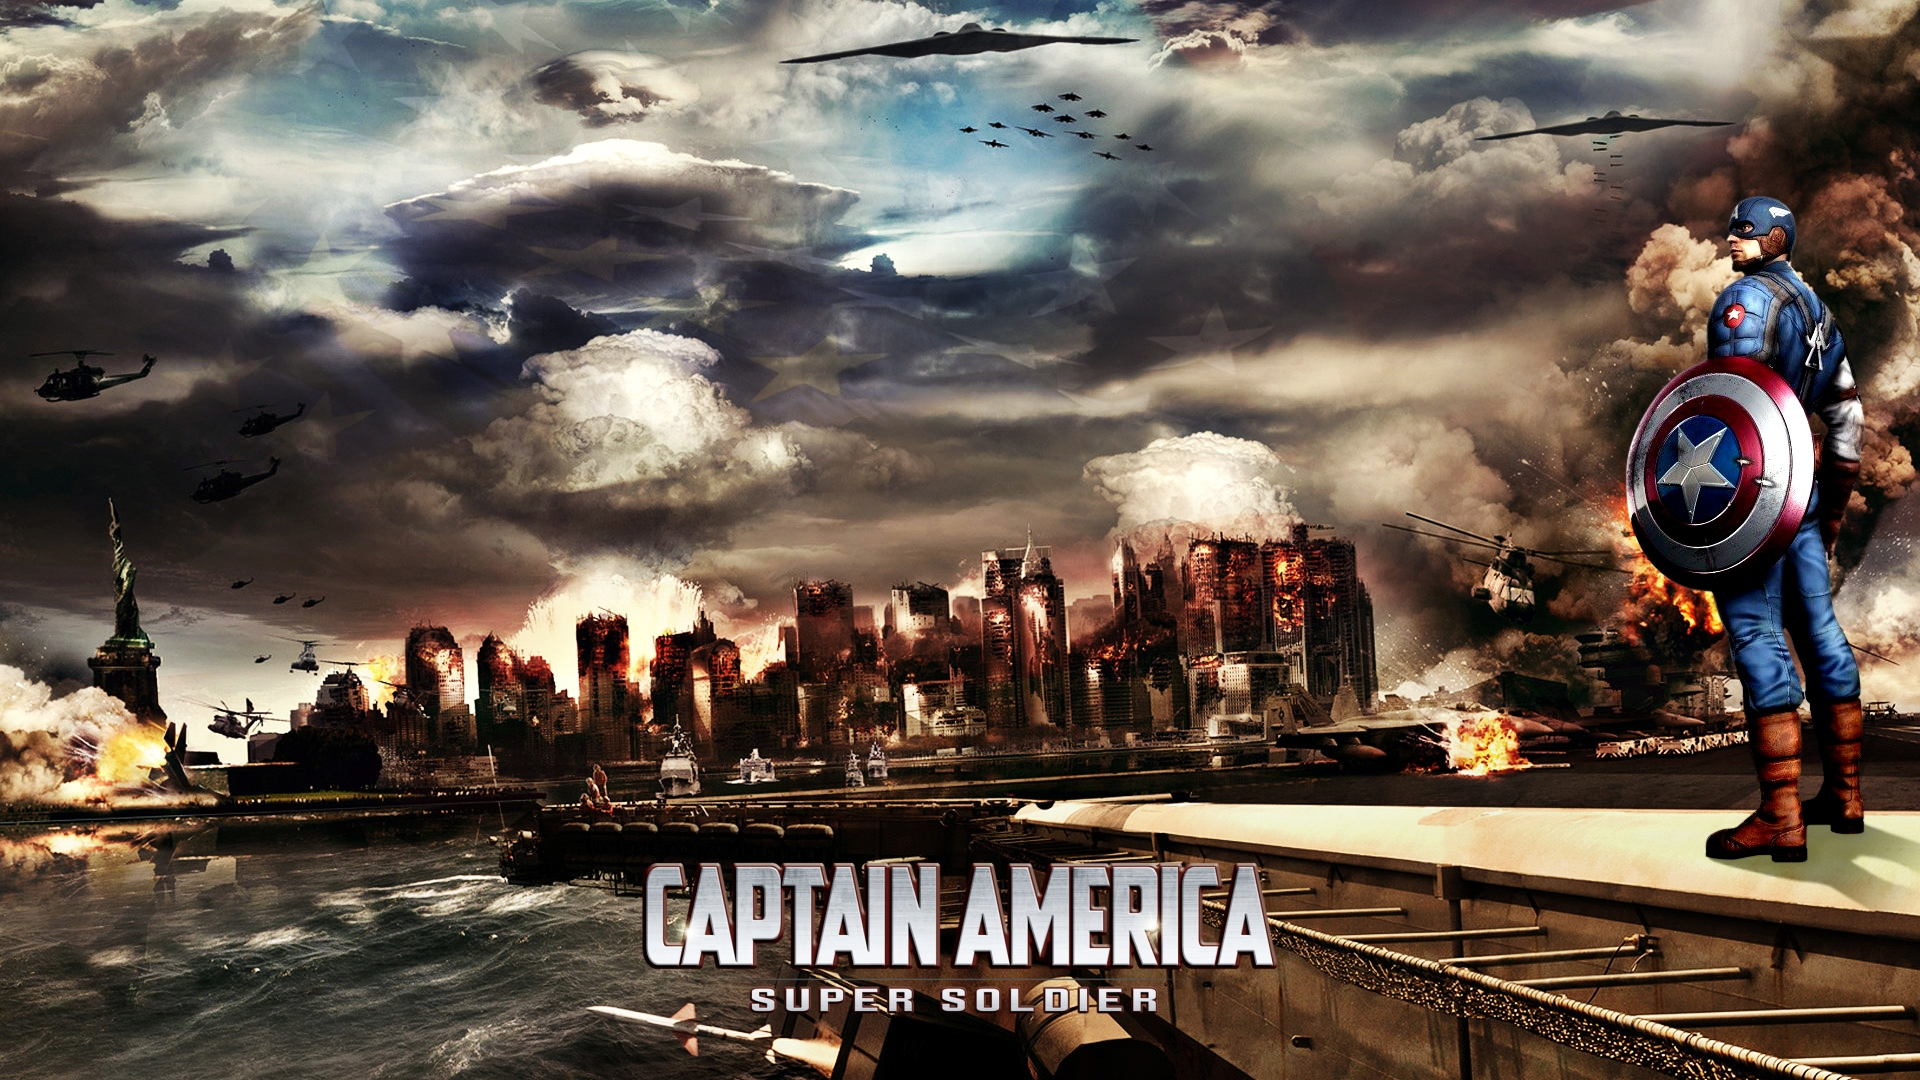 Captain-America-Destruction-Wallpaper